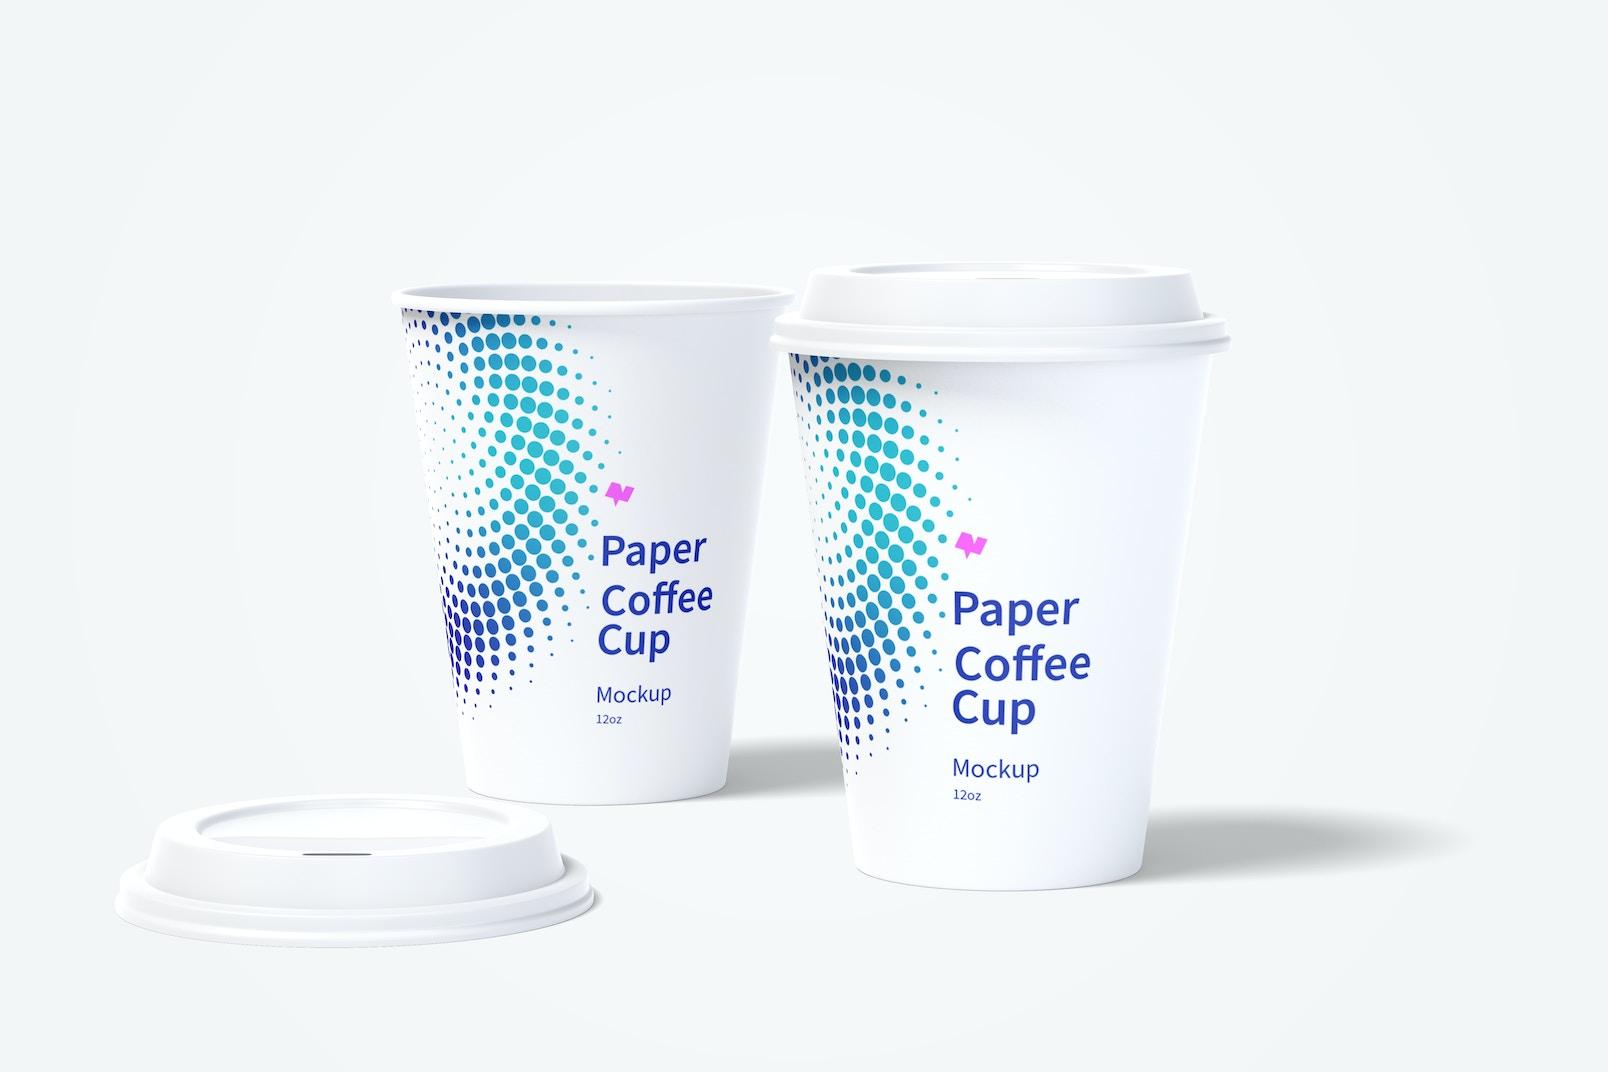 12oz Paper Coffee Cups Mockup 03